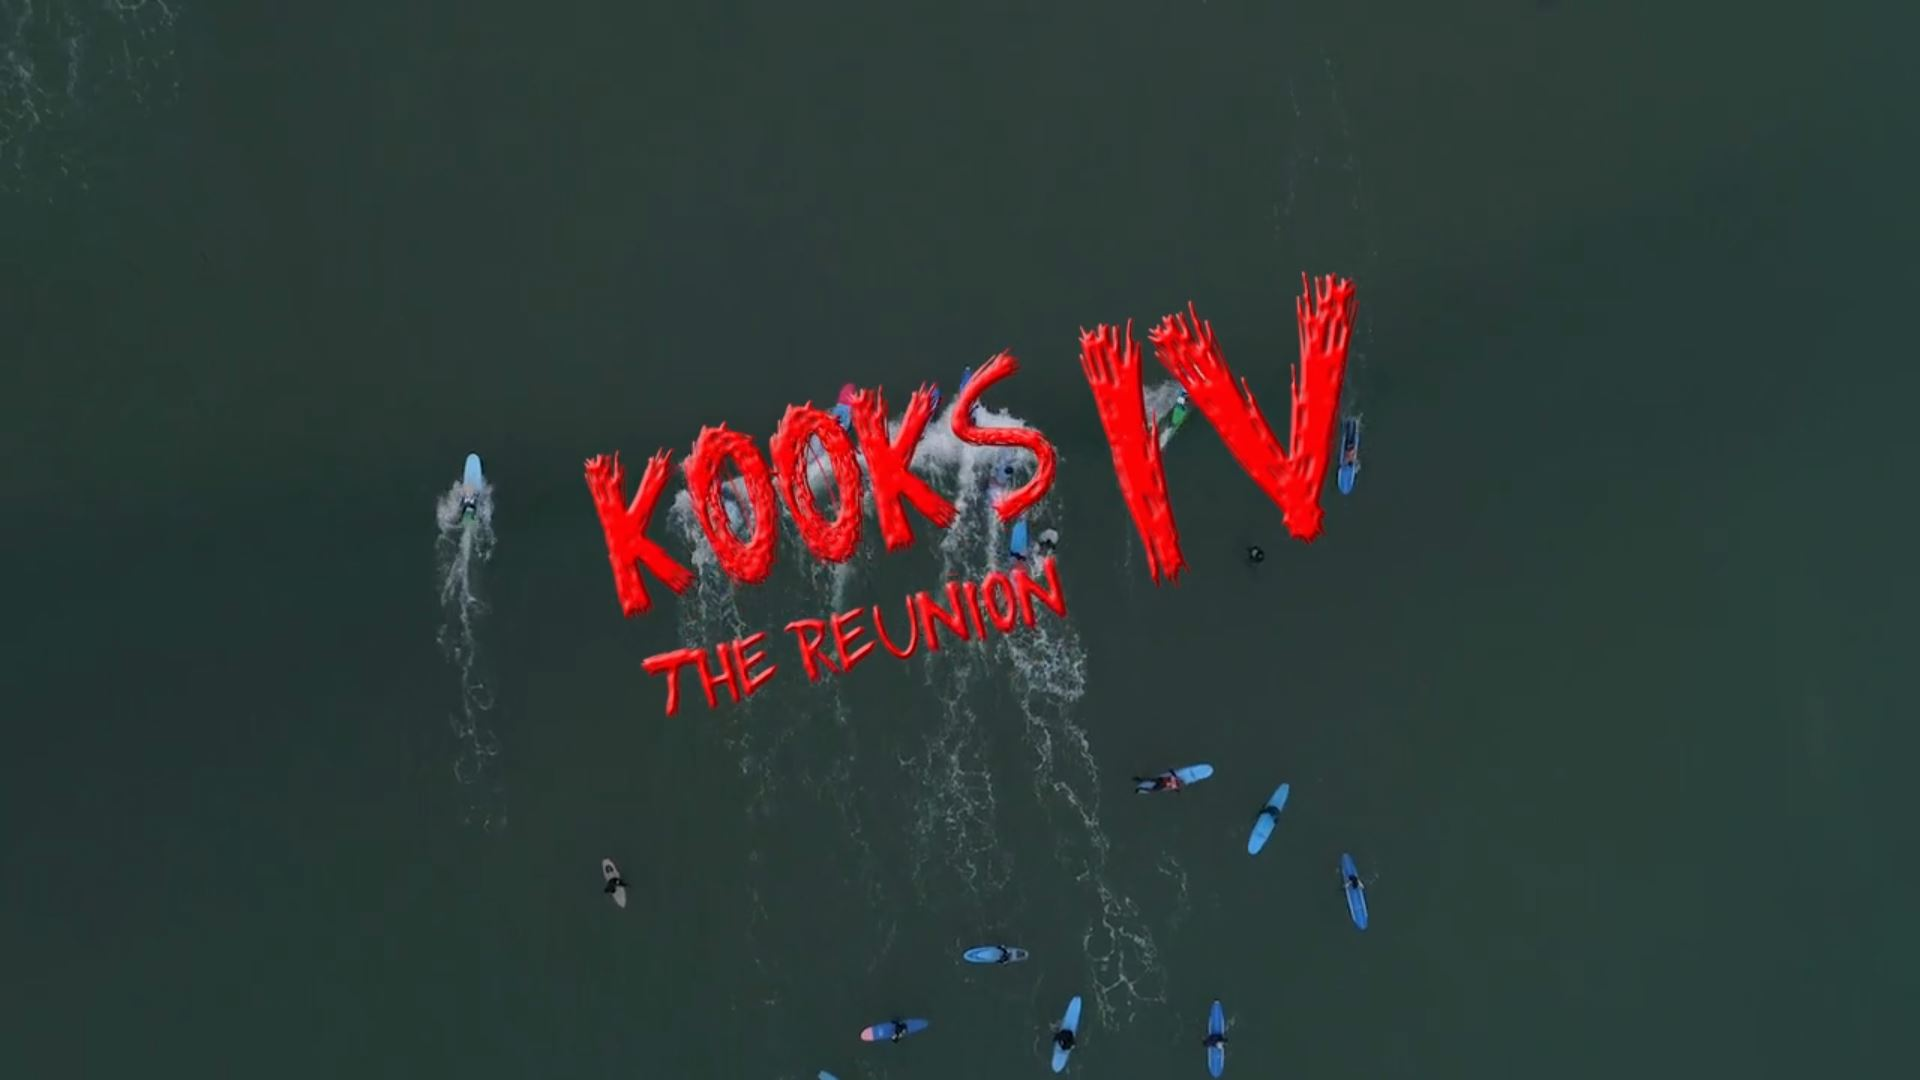 Kooks 4: The Reunion